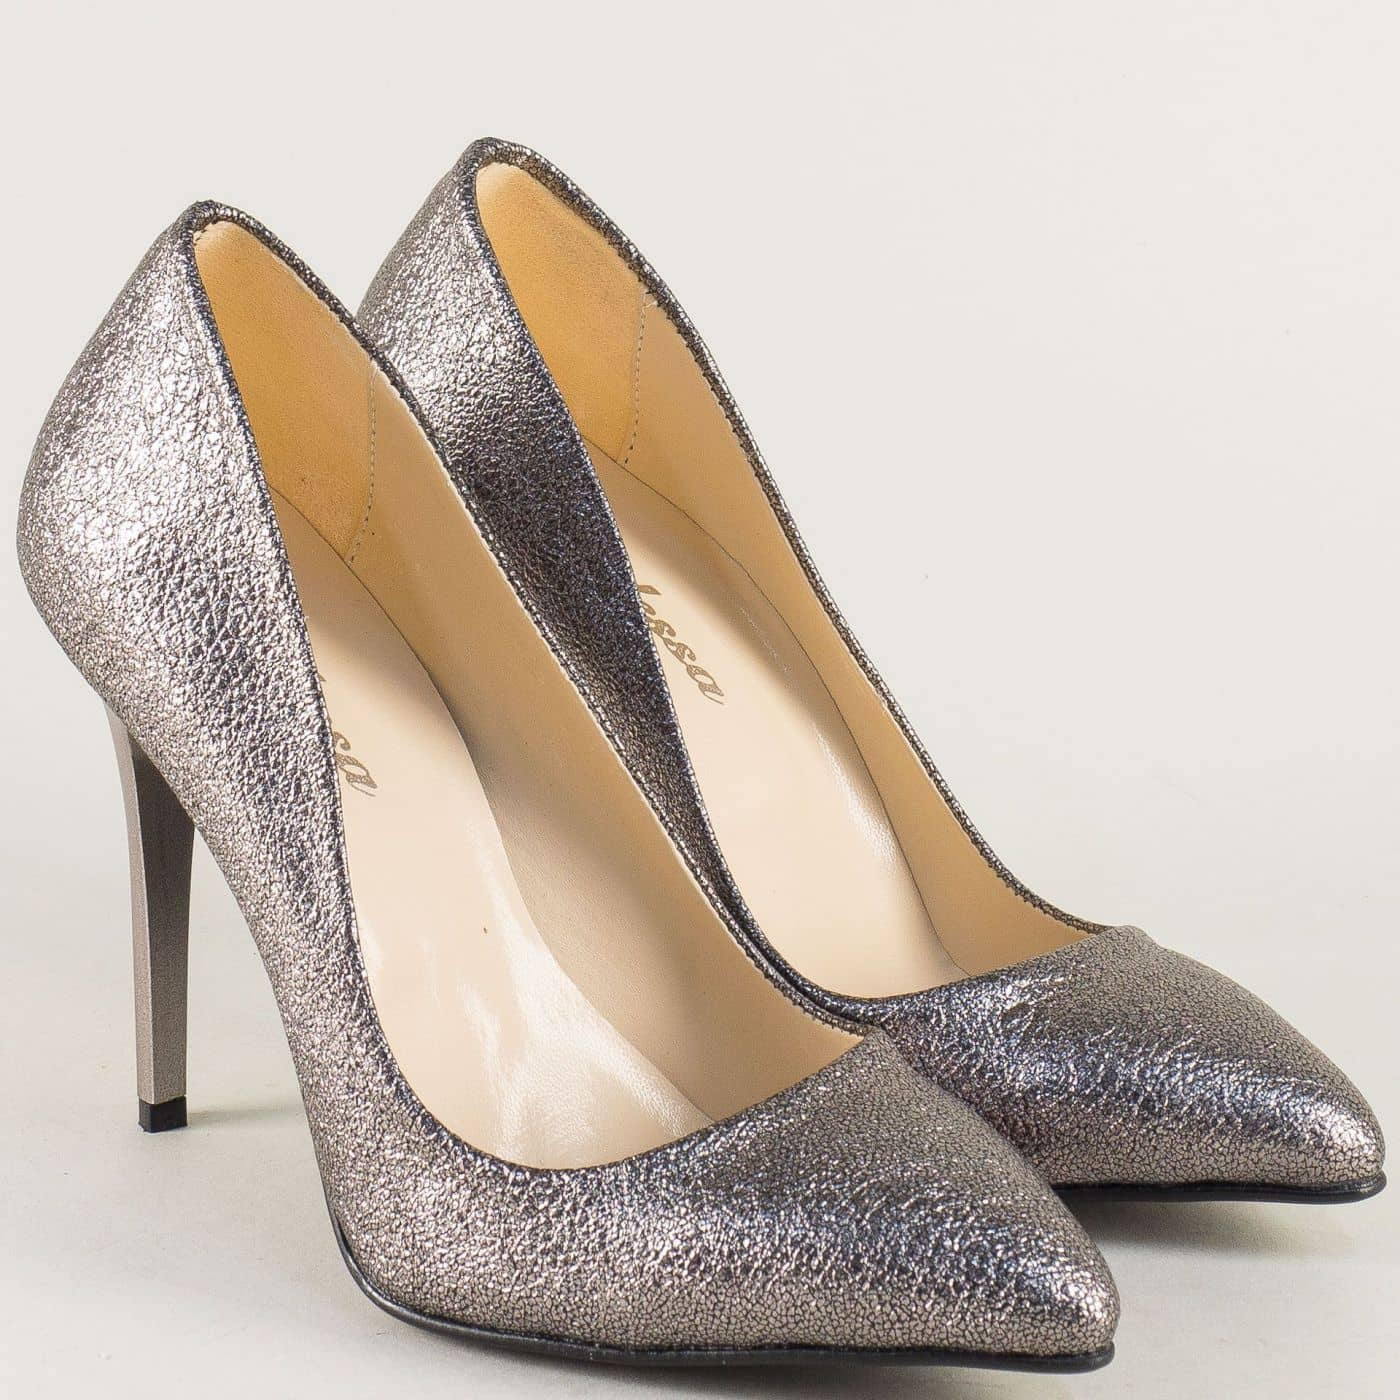 f1fd19de9a2 Бронзови дамски обувки стилето на висок ток 5596brz - Sisi-bg.com